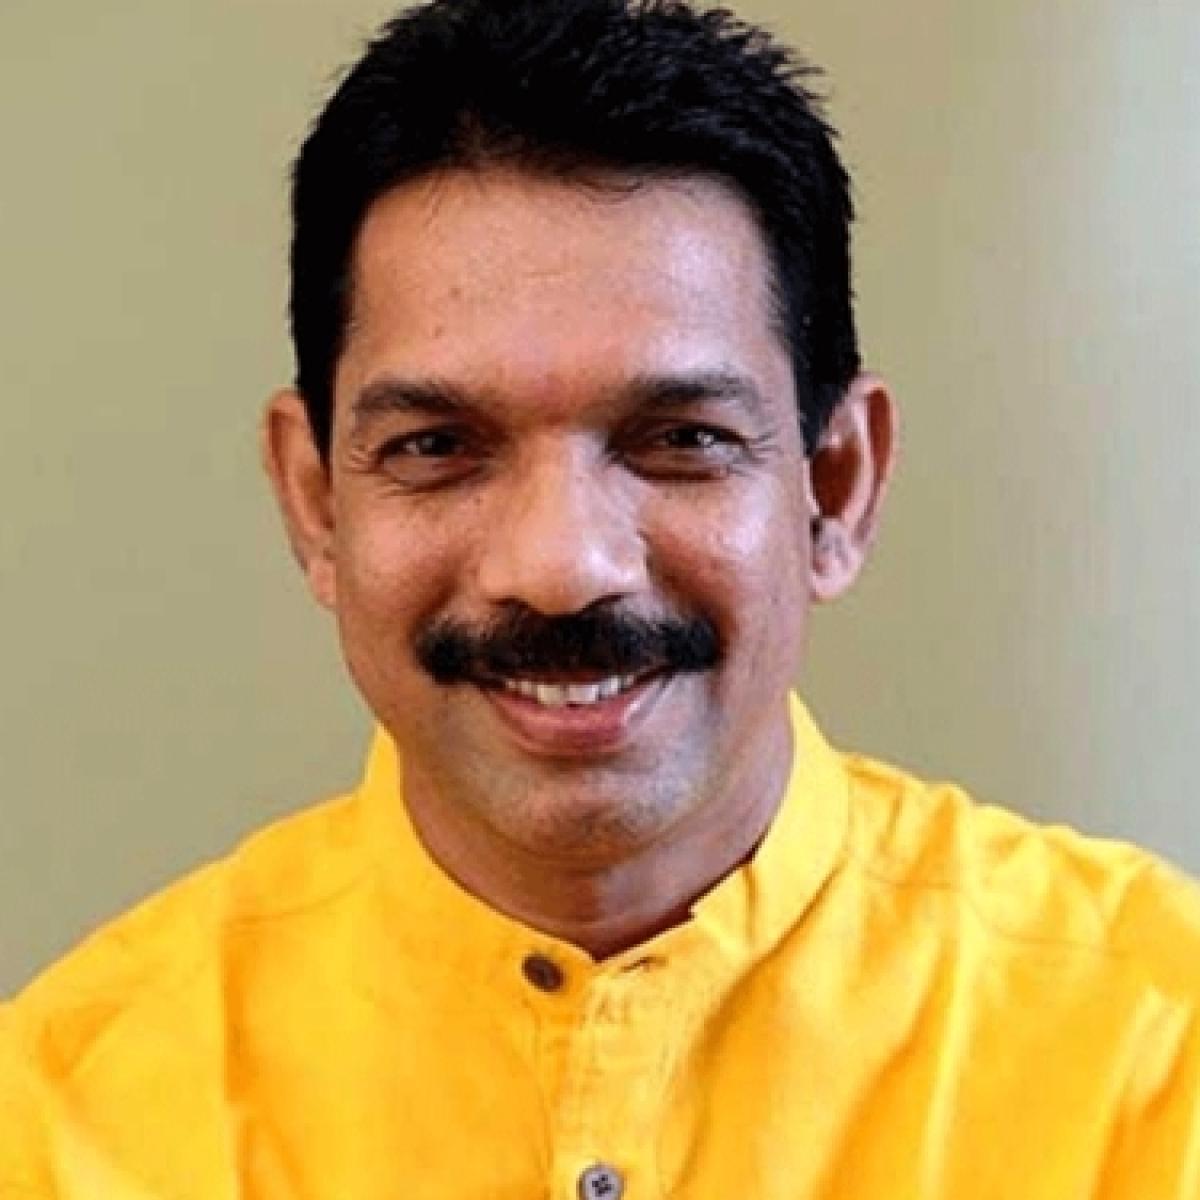 Mangaluru City Corporation polls: BJP president Nalin Kumar Kateel casts his vote at Ward No 26